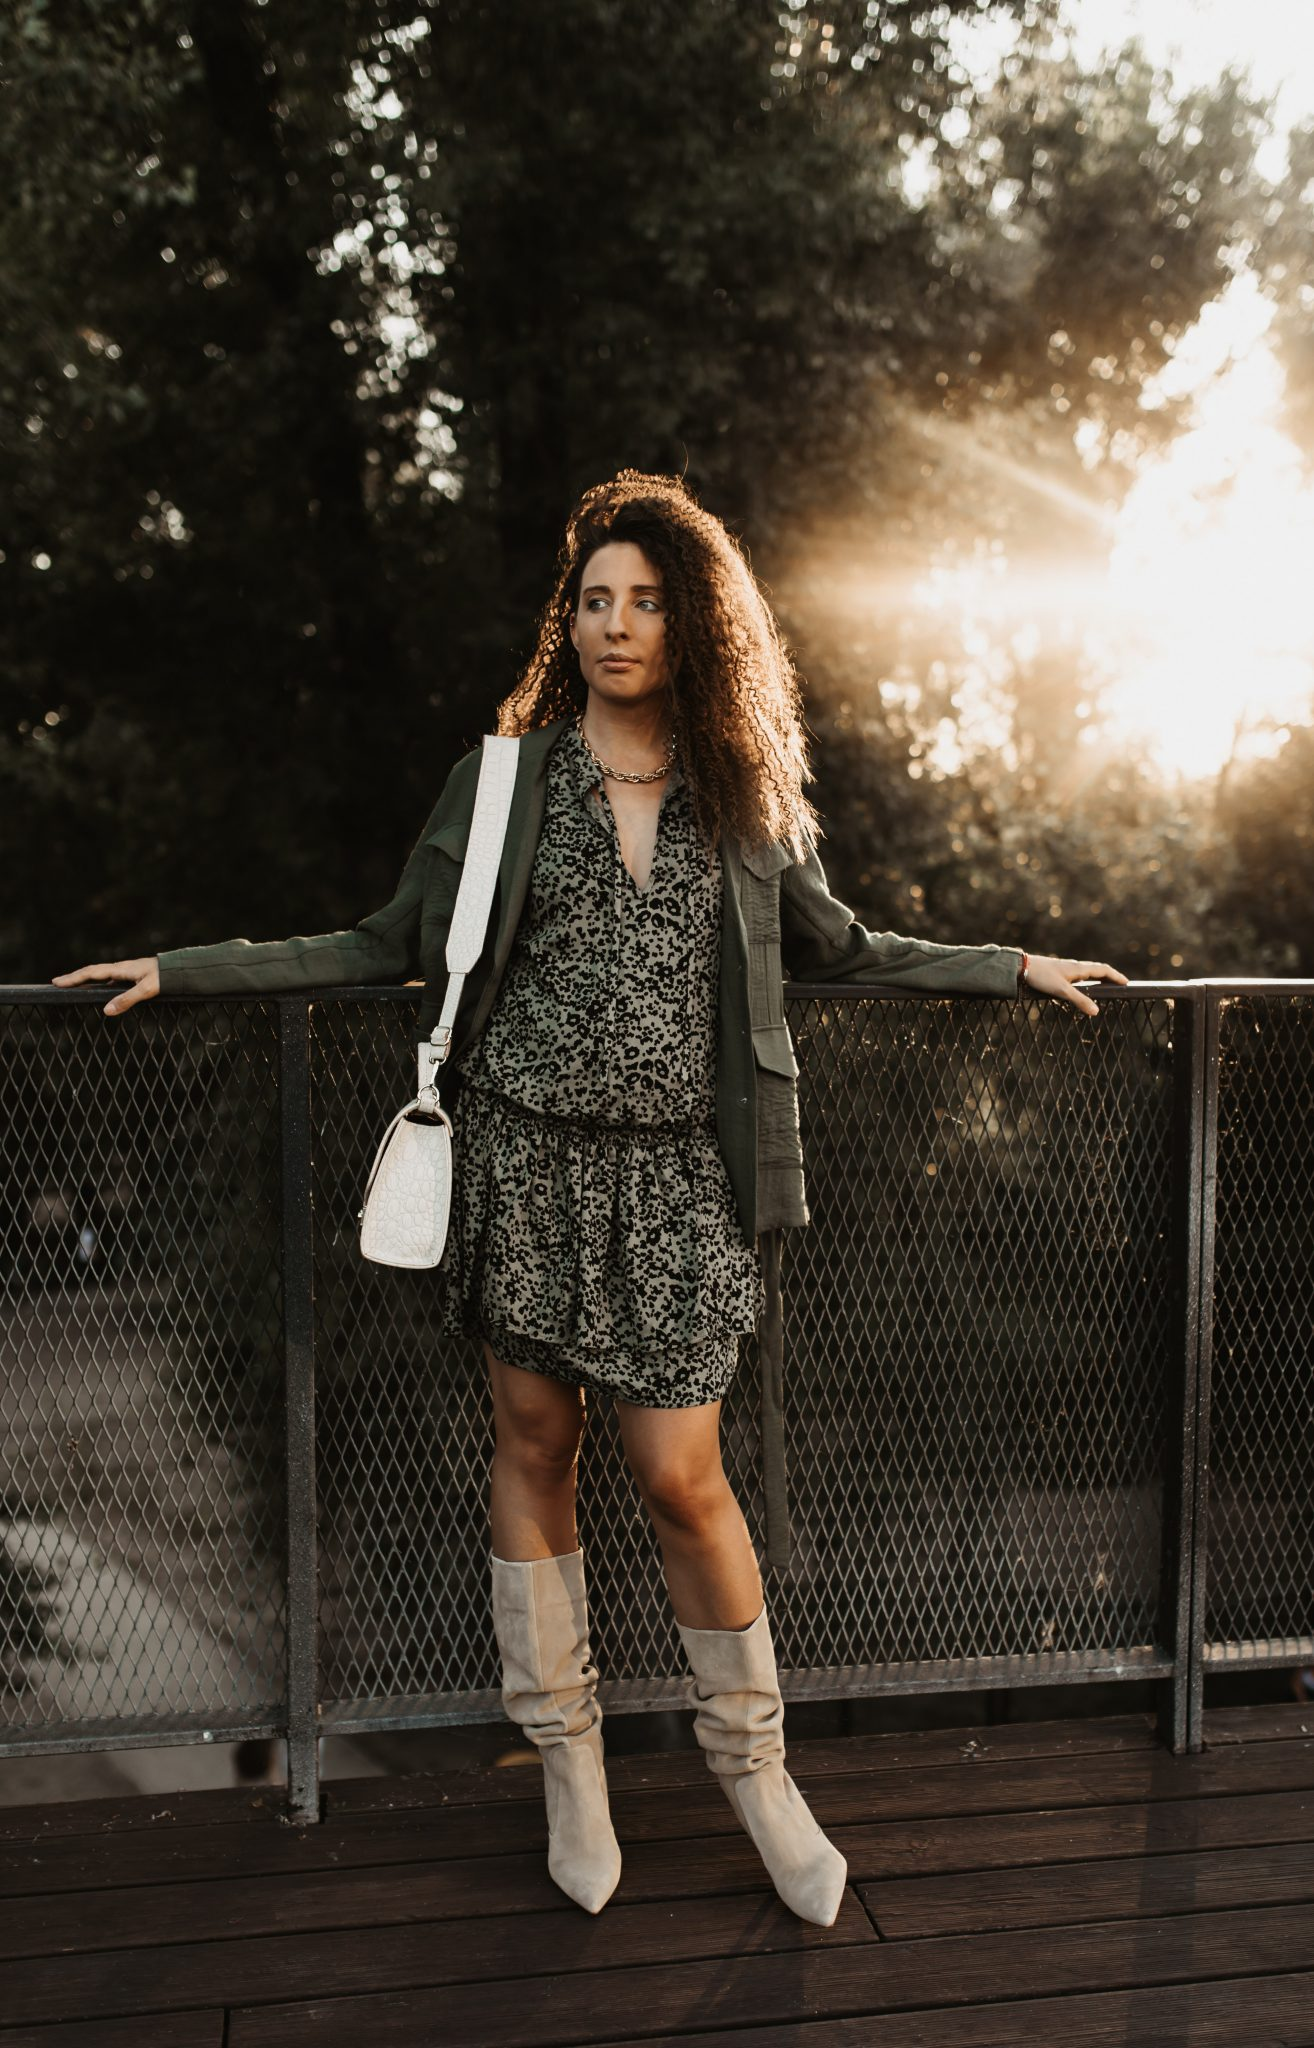 fraternity-blogerka-modowa-stylistka-war